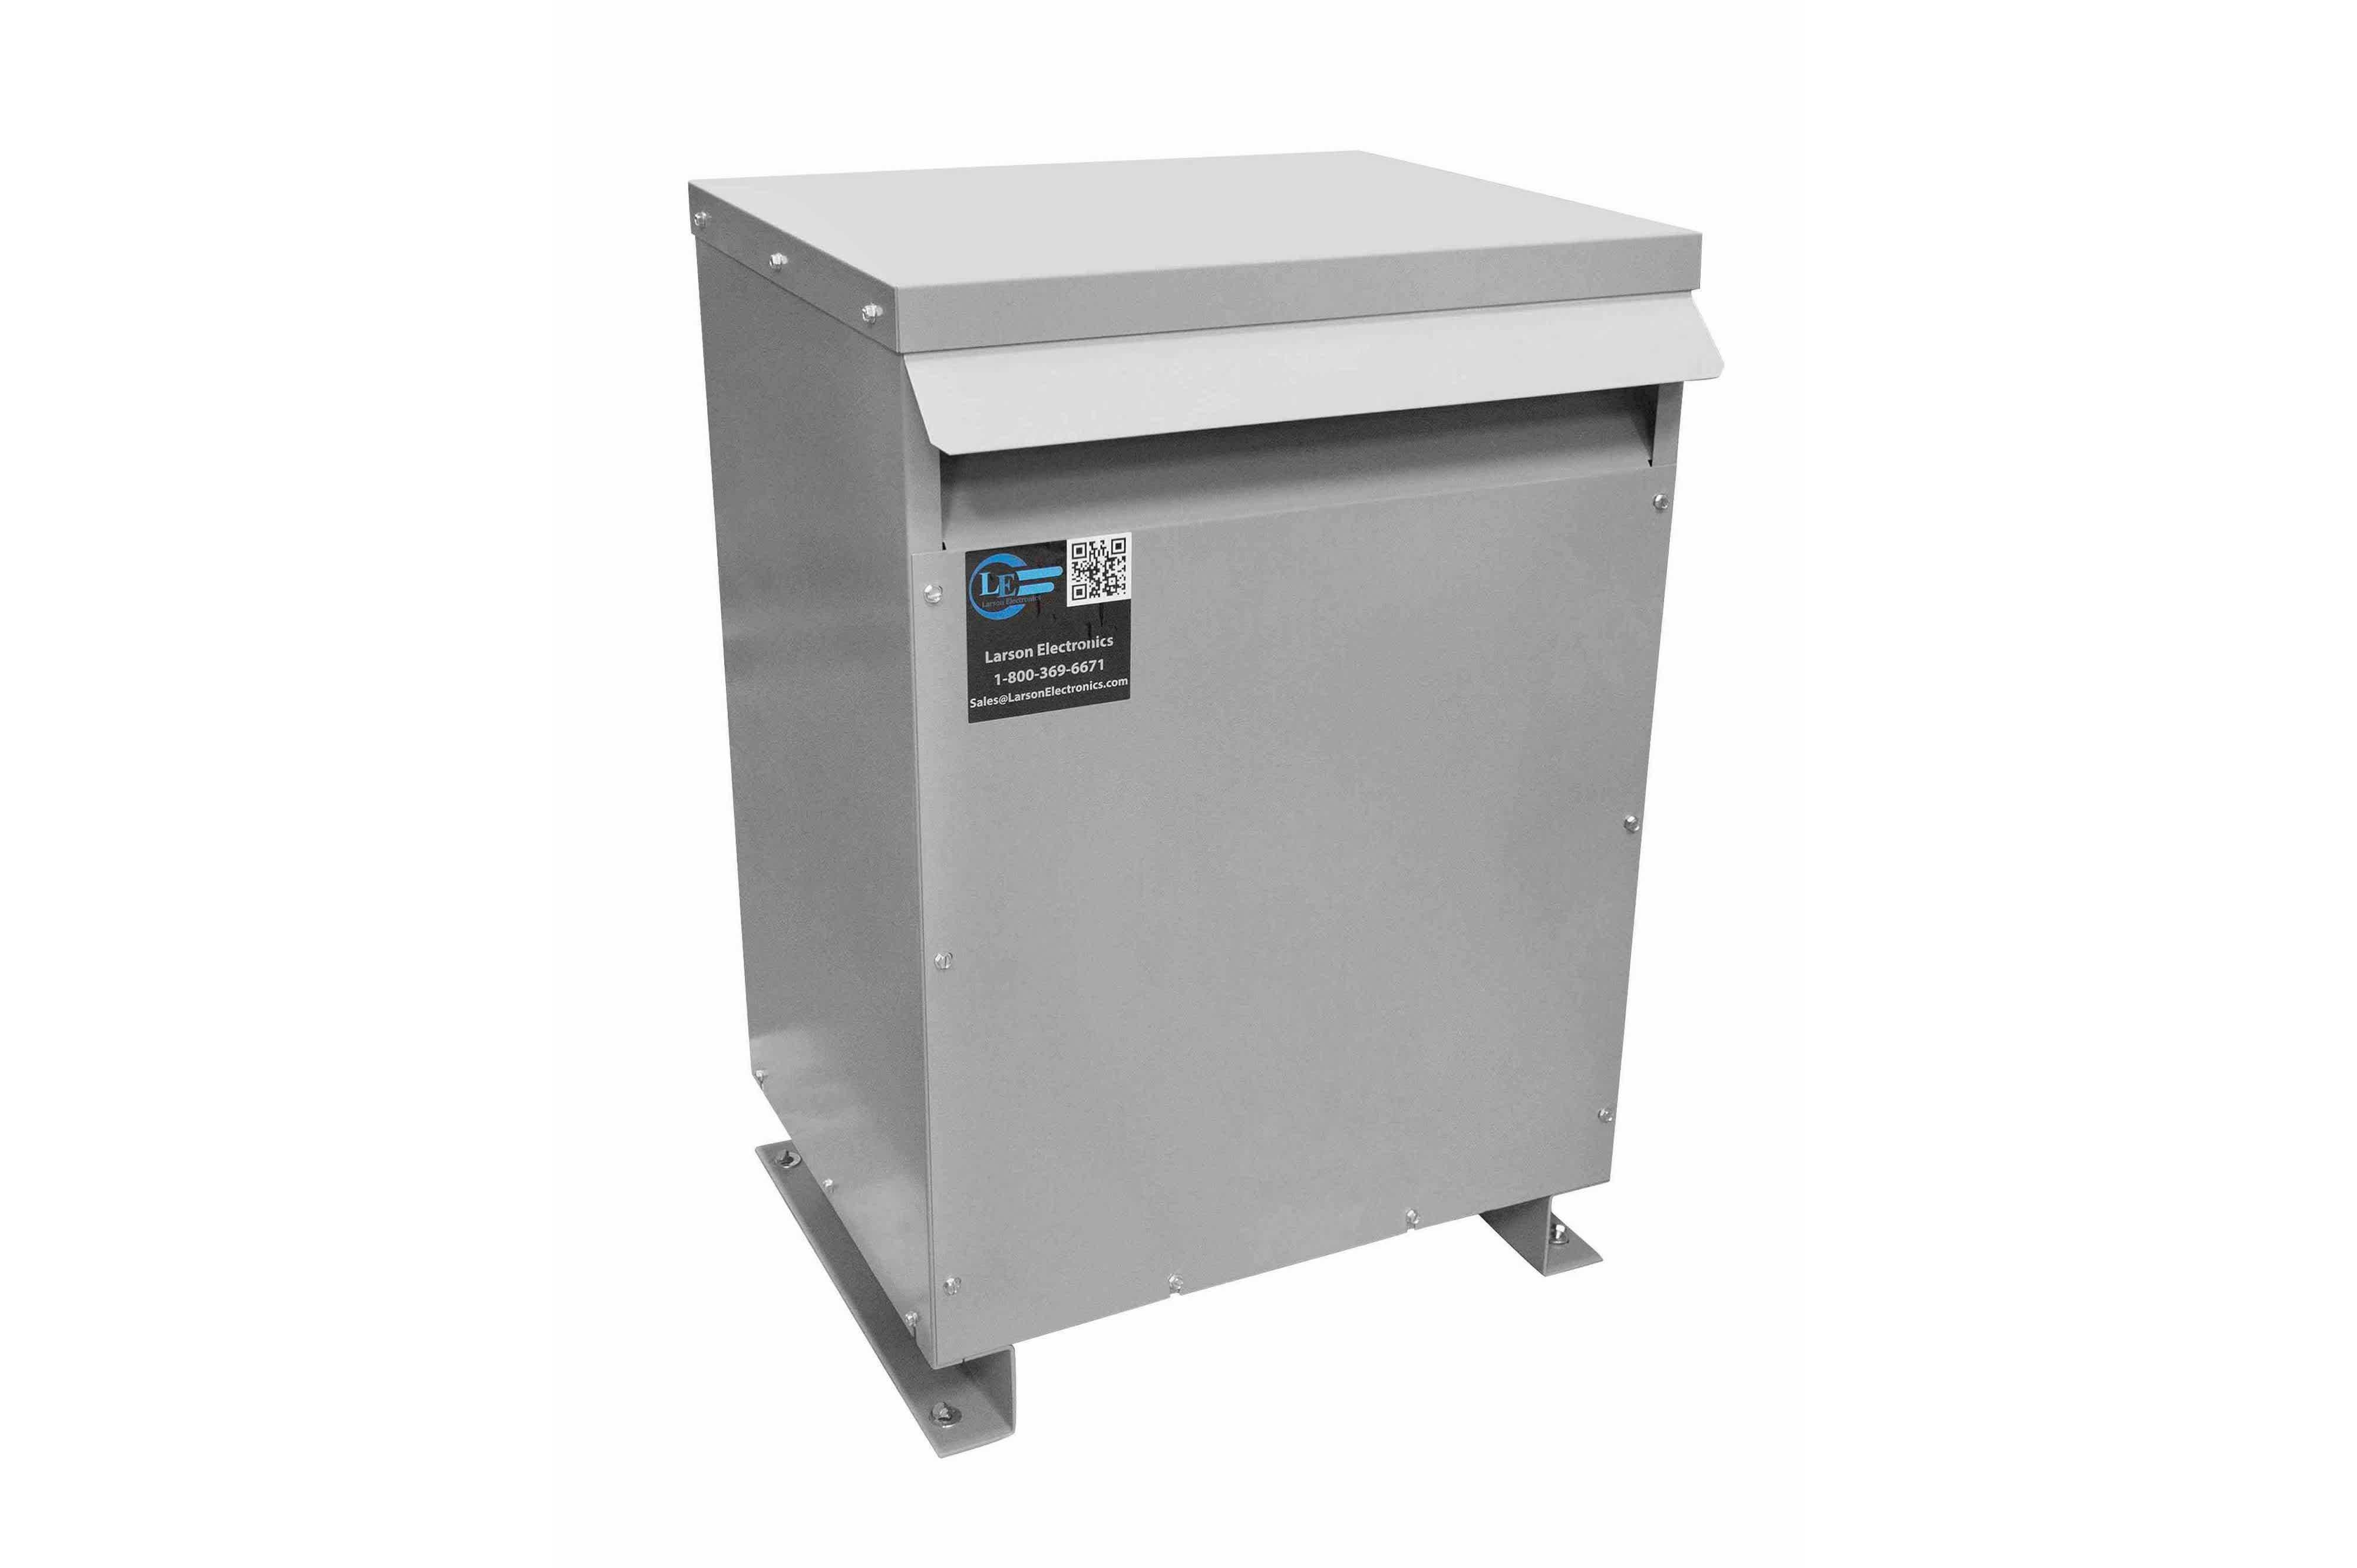 18 kVA 3PH Isolation Transformer, 380V Wye Primary, 600Y/347 Wye-N Secondary, N3R, Ventilated, 60 Hz